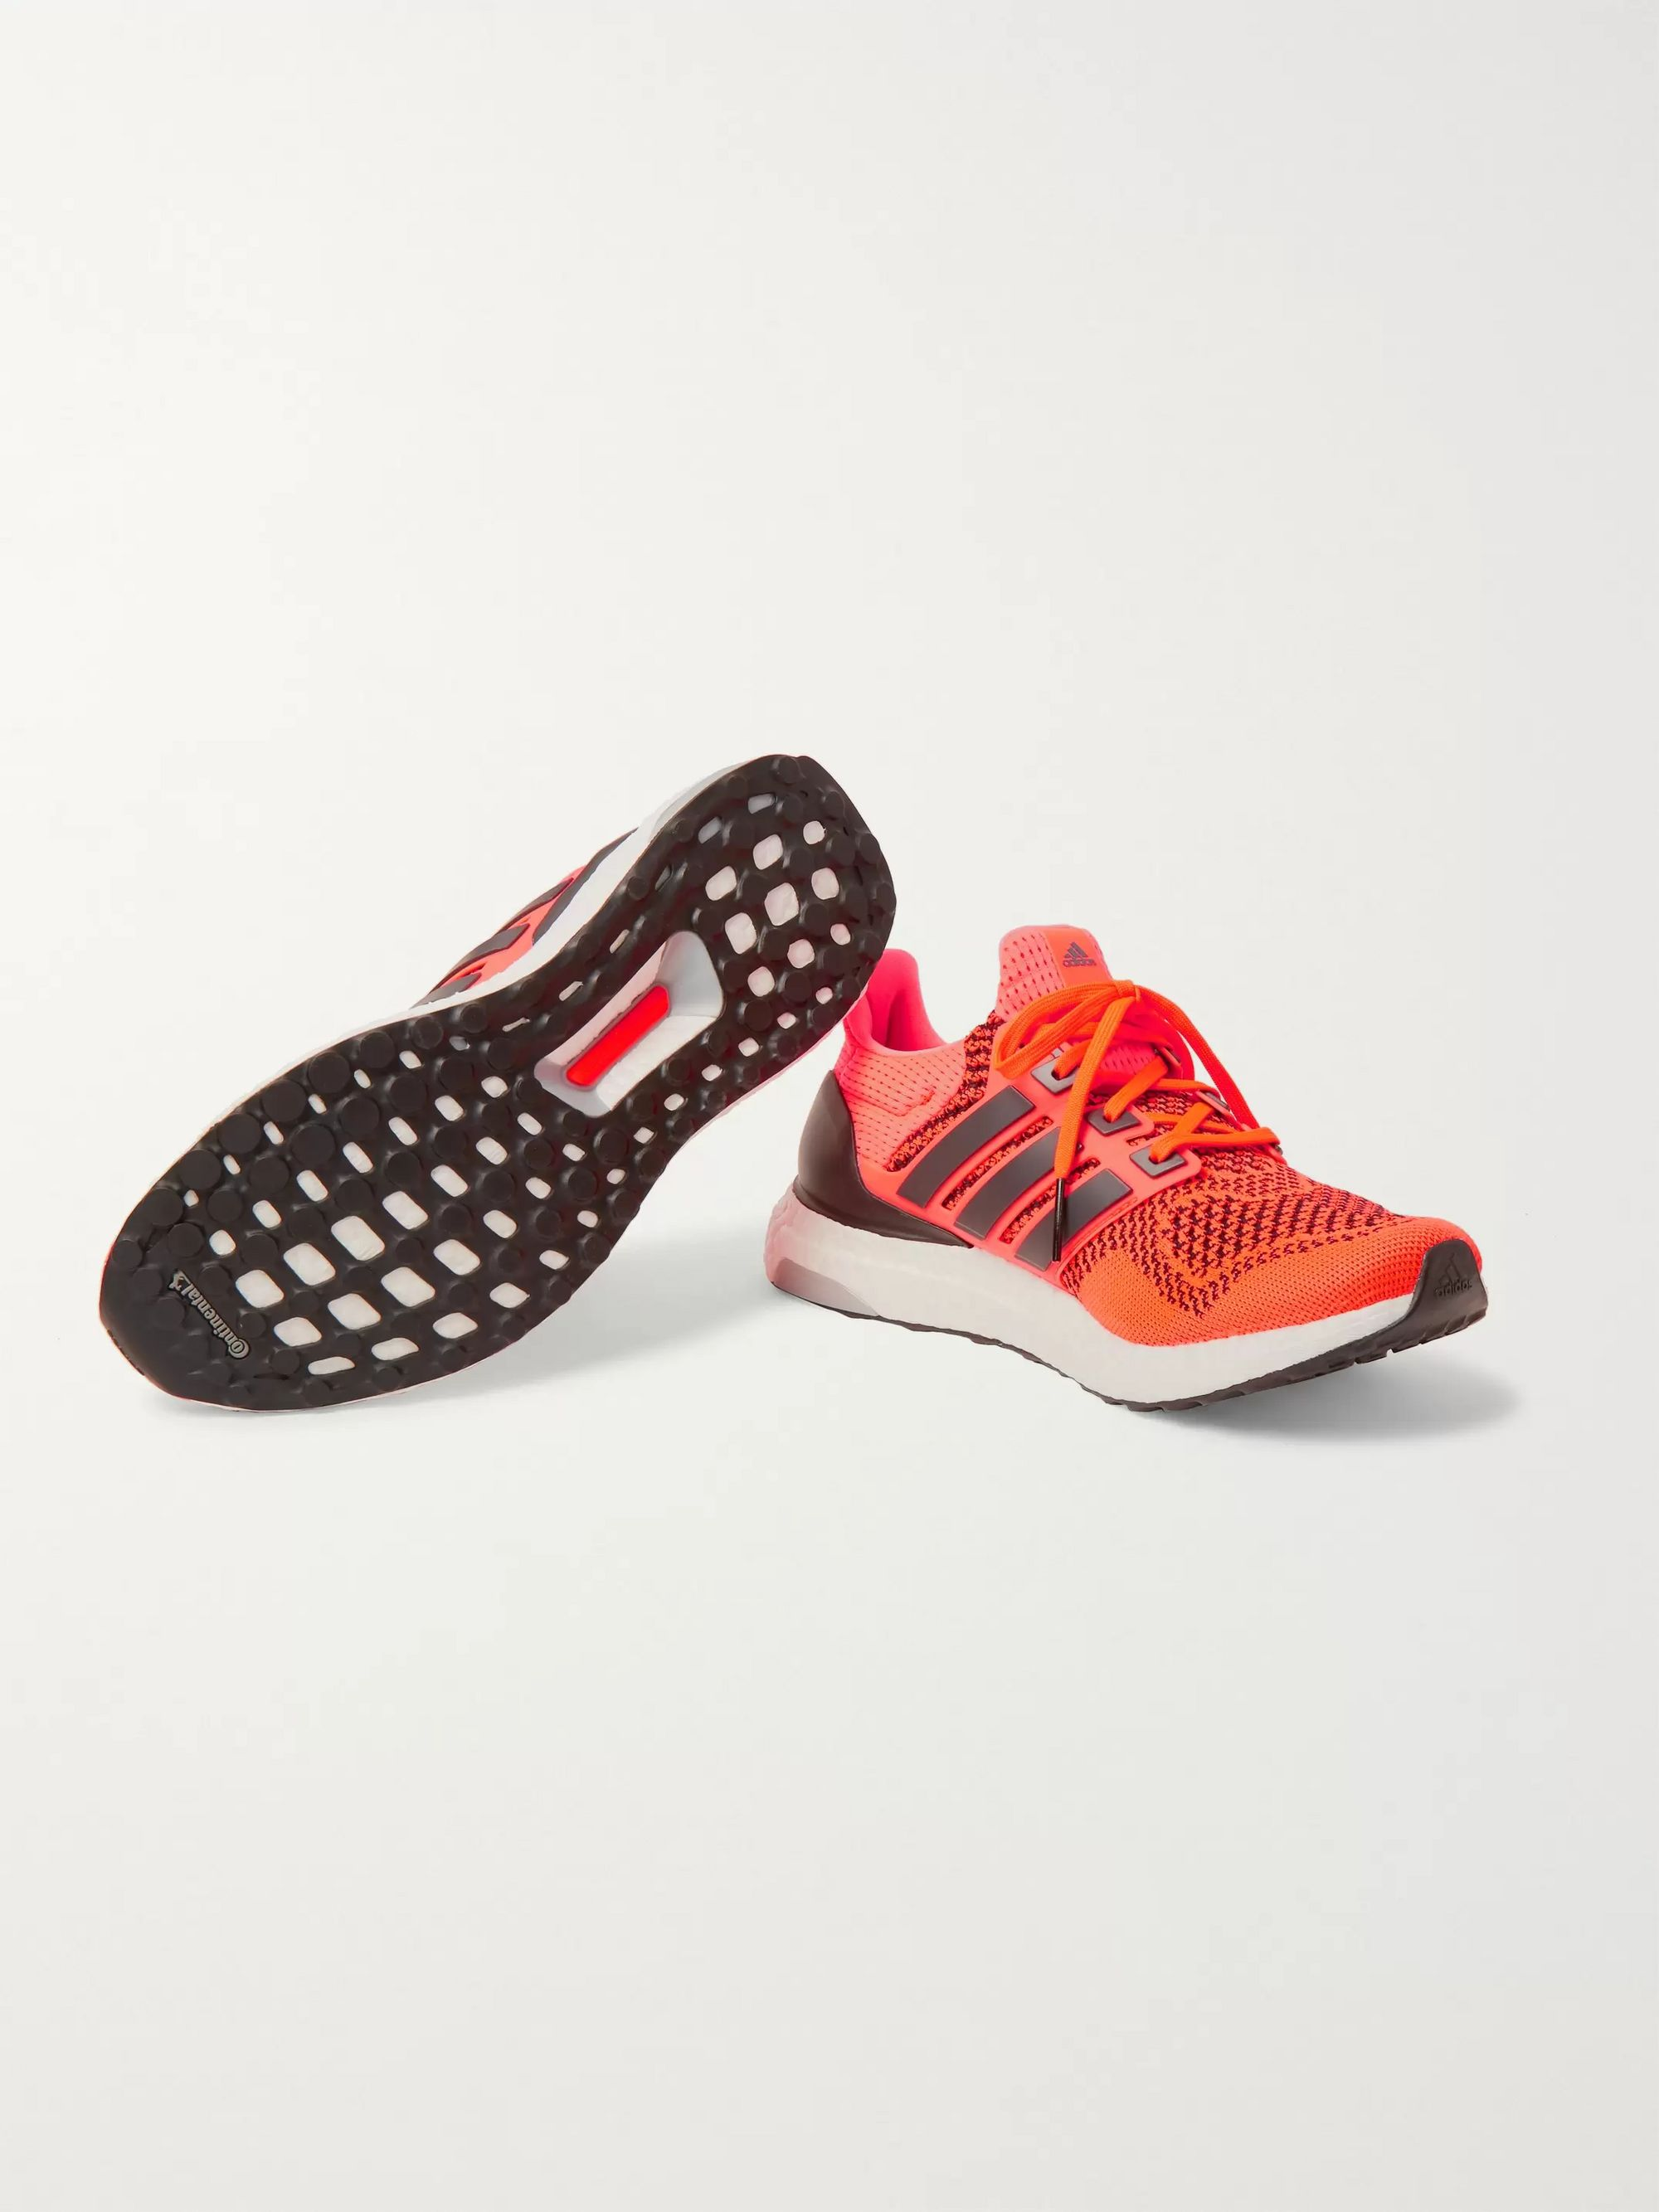 UltraBOOST 1.0 Rubber Trimmed Primeknit Running Sneakers